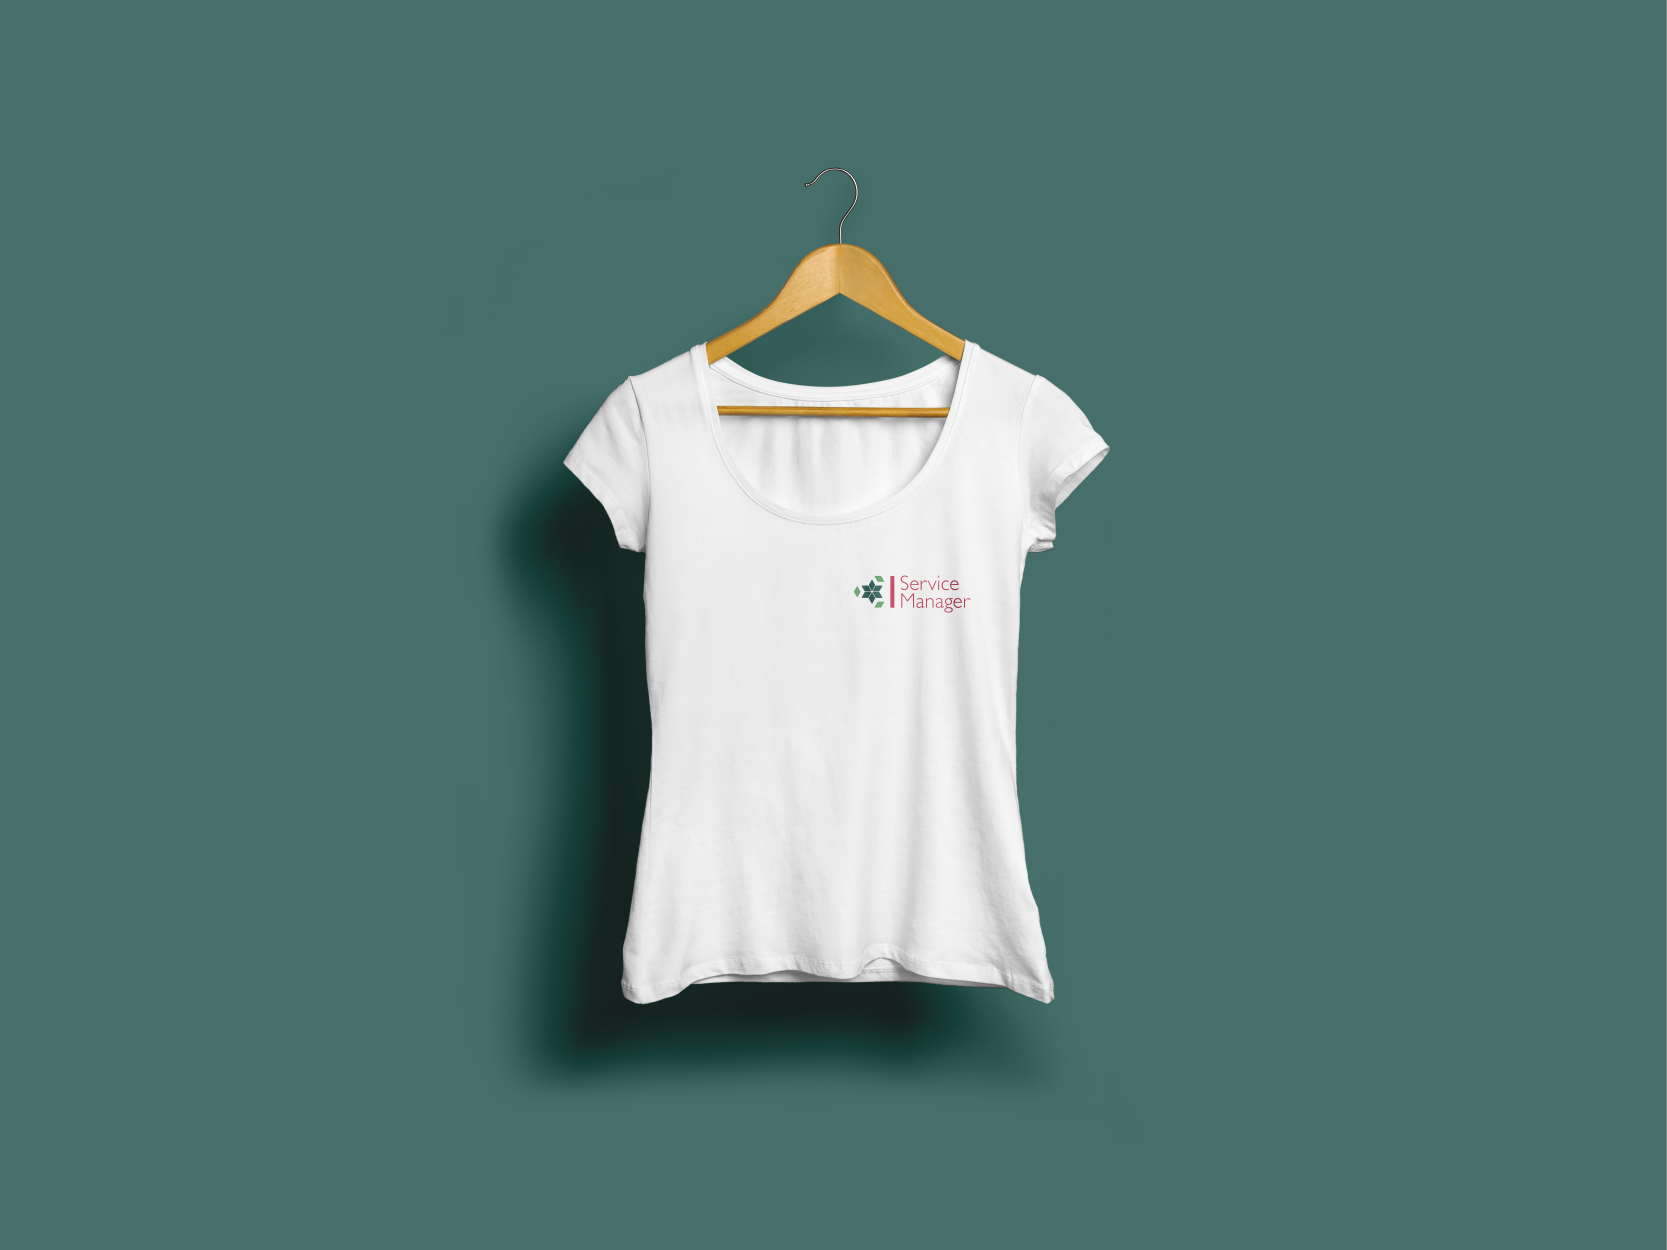 company t-shirt sub-brand design